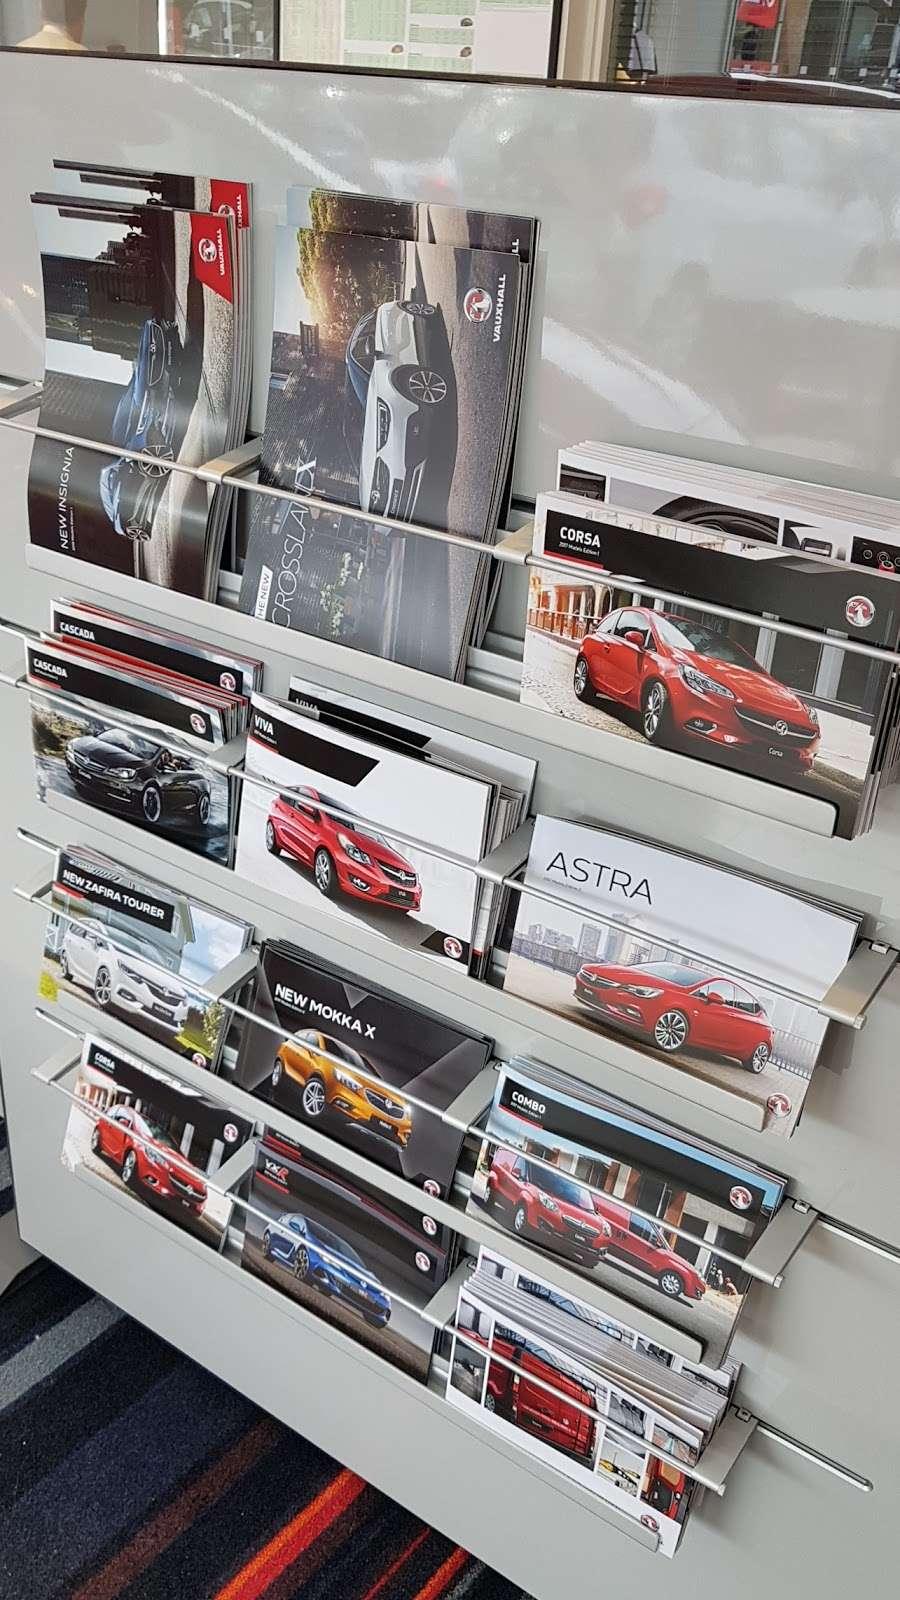 GO Vauxhall Sevenoaks - car dealer  | Photo 10 of 10 | Address: Mill Rd, Dunton Green, Sevenoaks TN13 2UZ, UK | Phone: 01732 449947